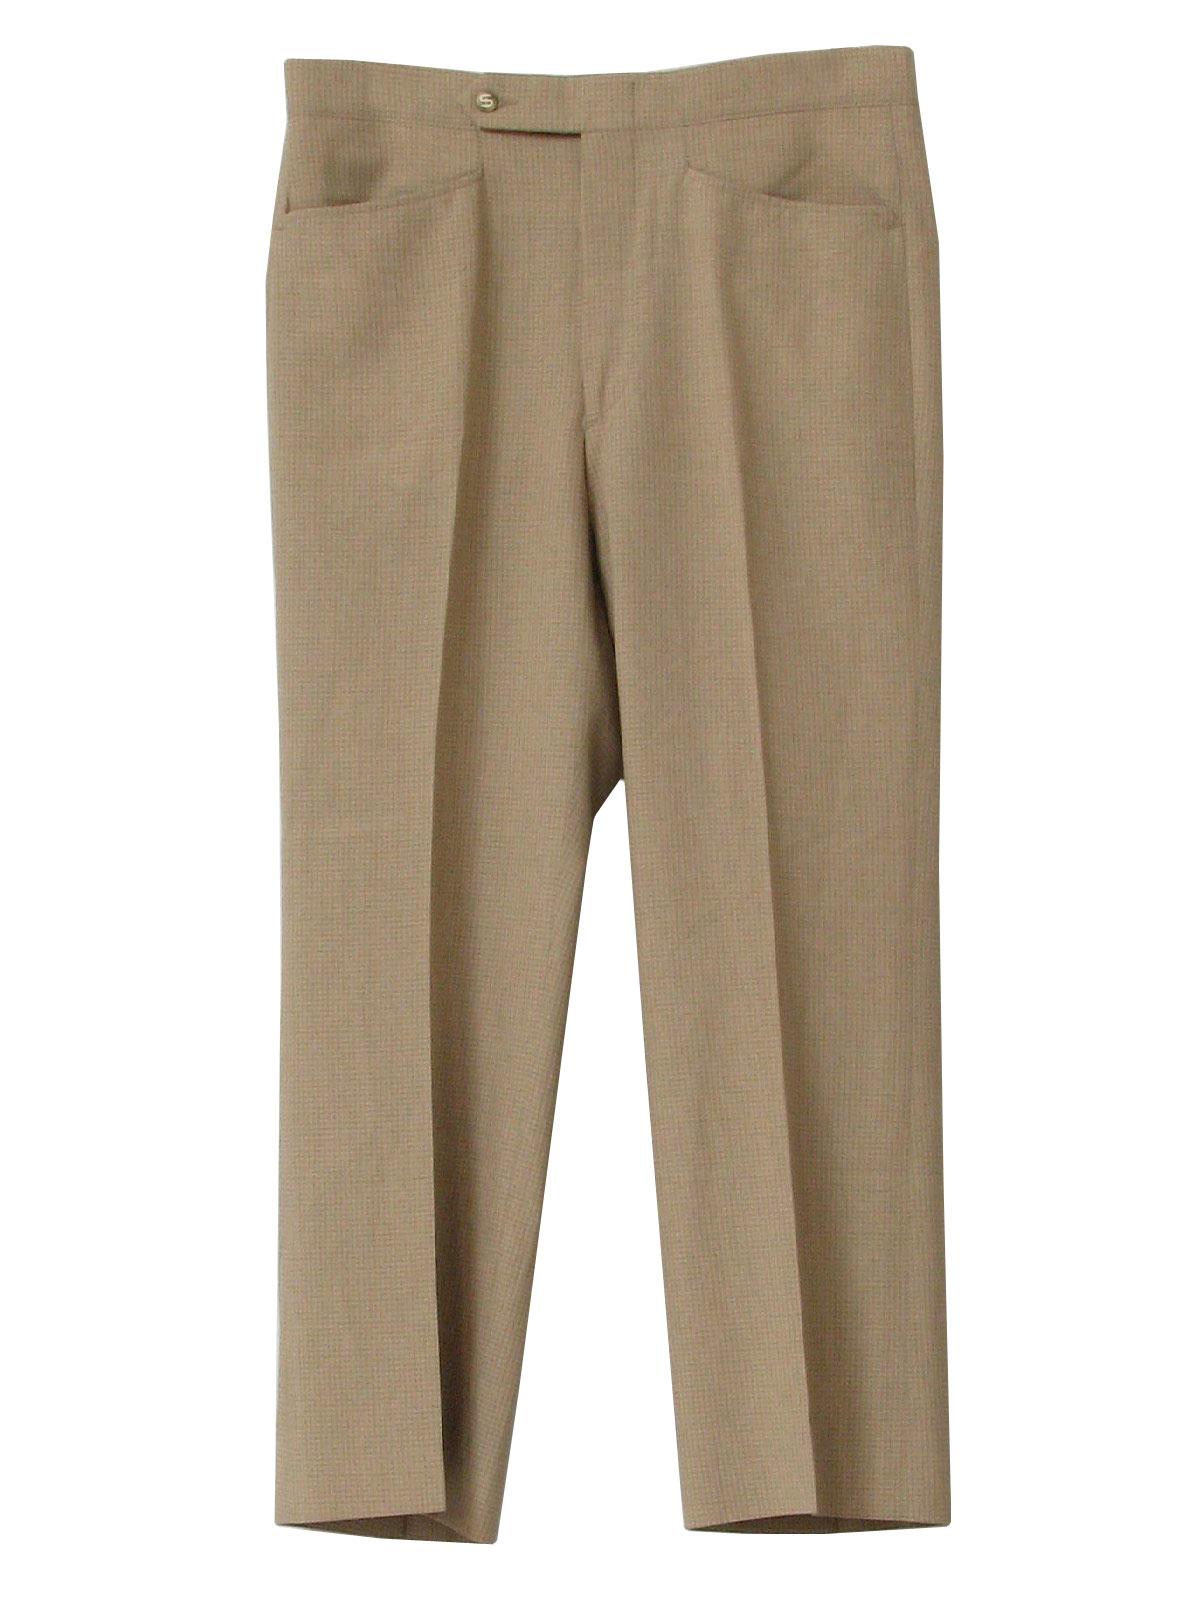 Seventies Sansabelt Pants 70s Sansabelt Mens Shaded Tan